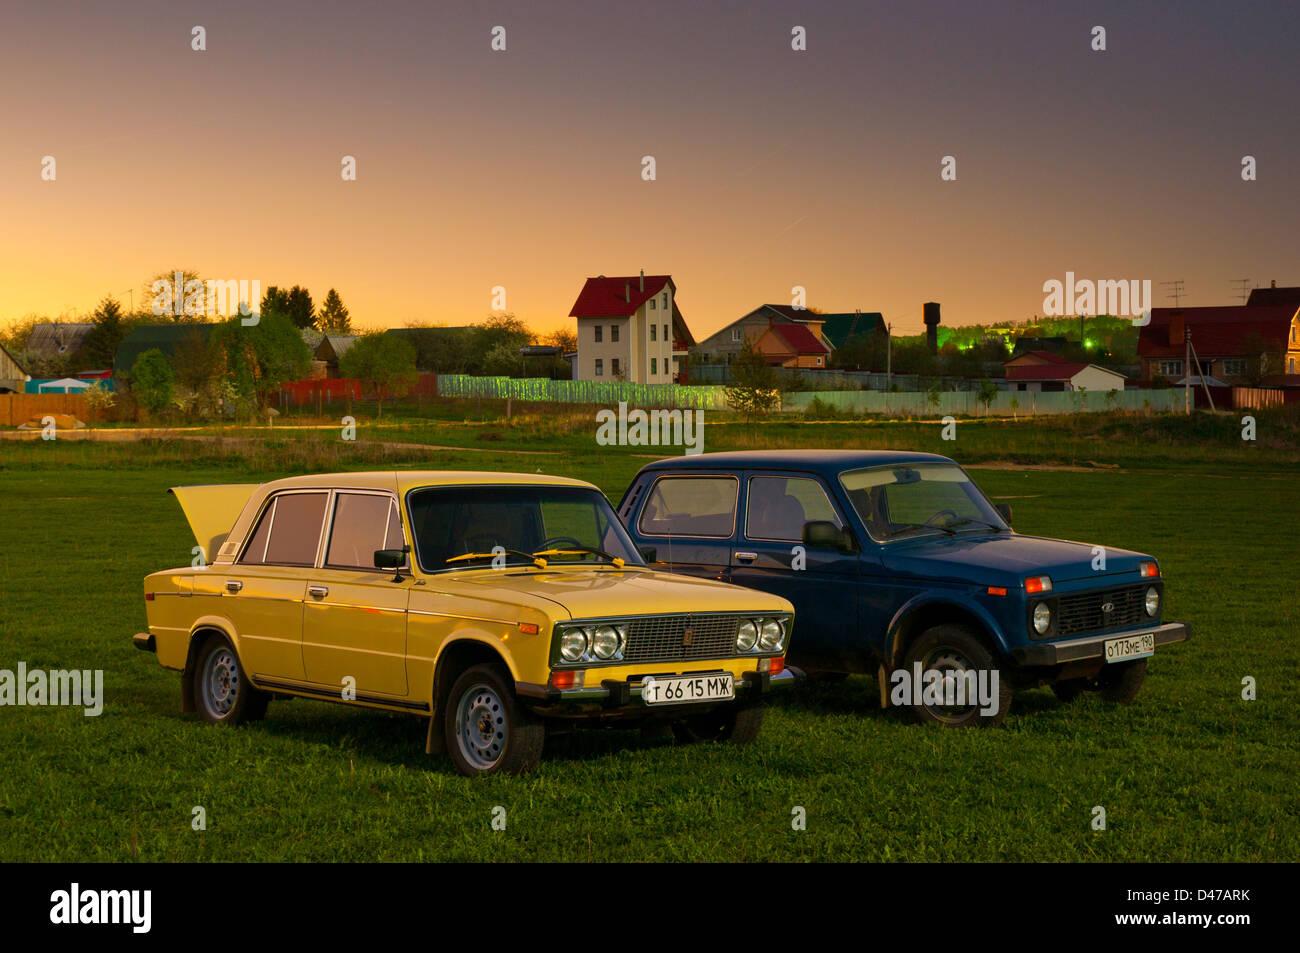 Soviet and Russian cars Lada Niva 4x4 (VAZ-2121) and Lada 1600 (VAZ-2106)